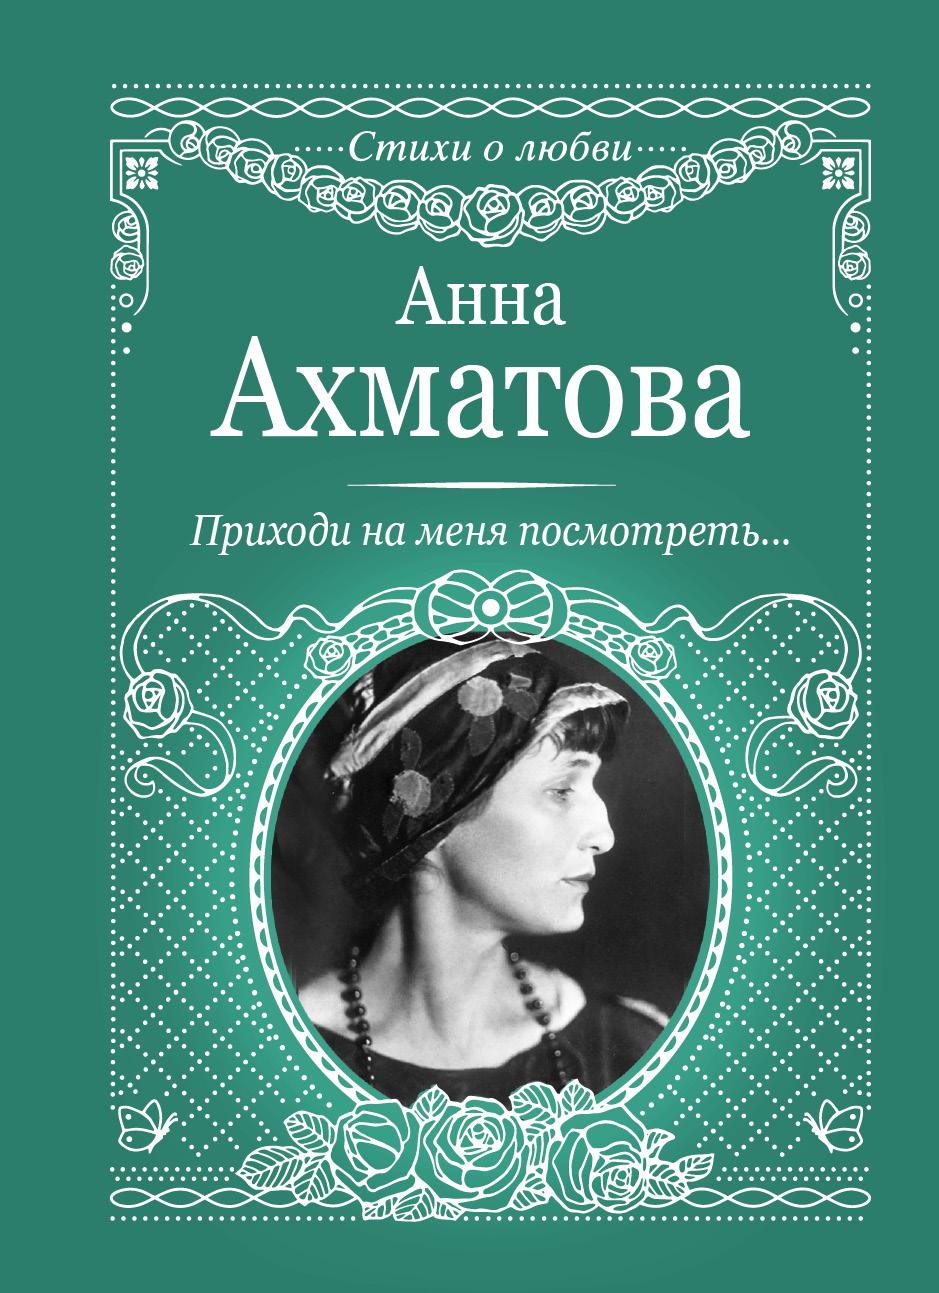 Анна Ахматова Приходи на меня посмотреть ахматова анна андреевна приходи на меня посмотреть